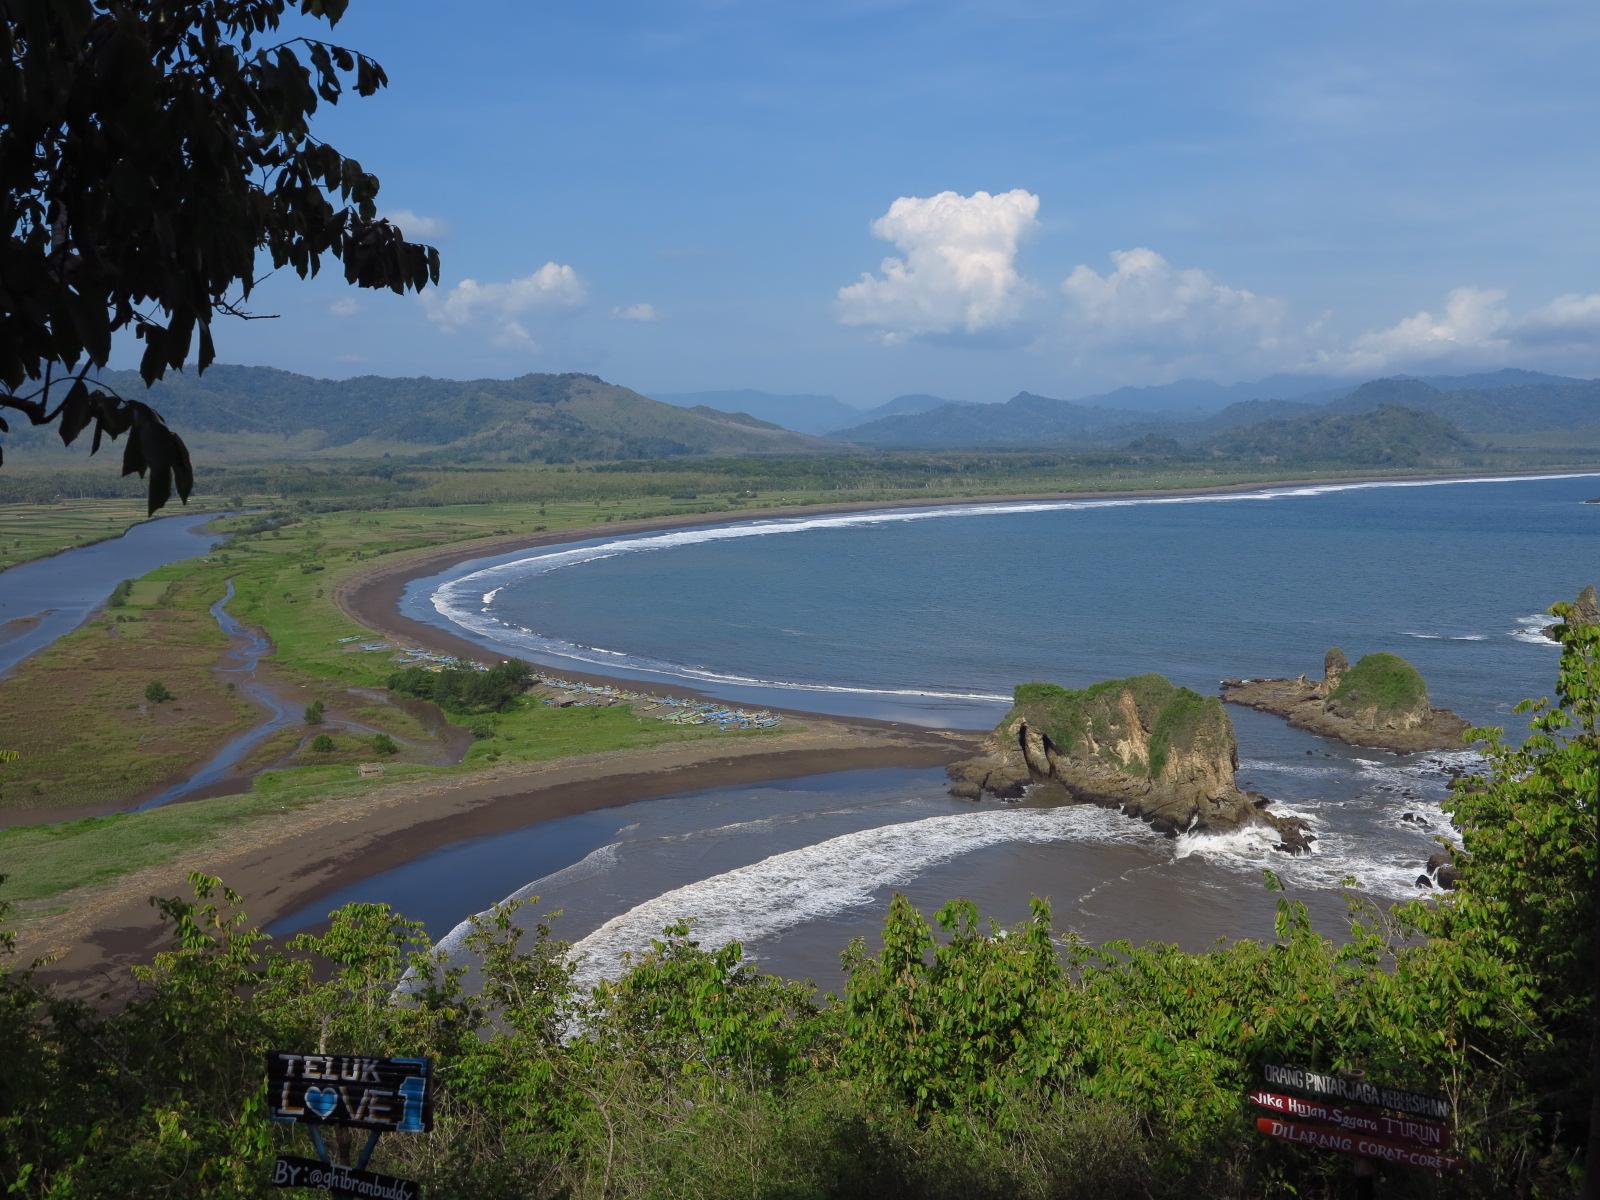 Jalan-jalan ke Jember : Pantai Watu Ulo, Pantai Papuma, Pantai